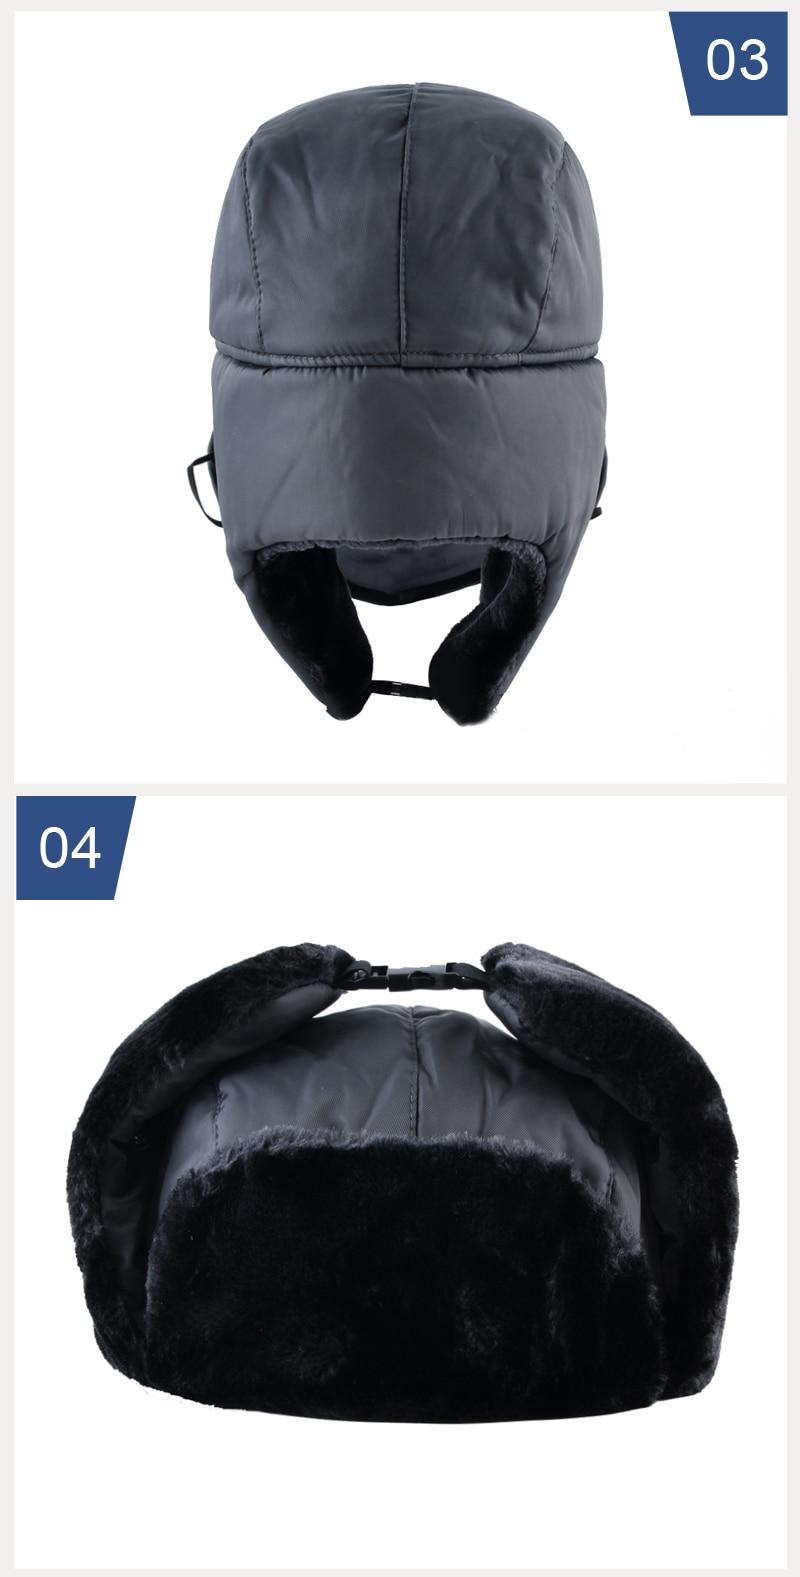 f4d37c38210 ... russian ushanka caps men. Style2   Winter hat bomber hats for men  thicken balaclava. 2 3 ...